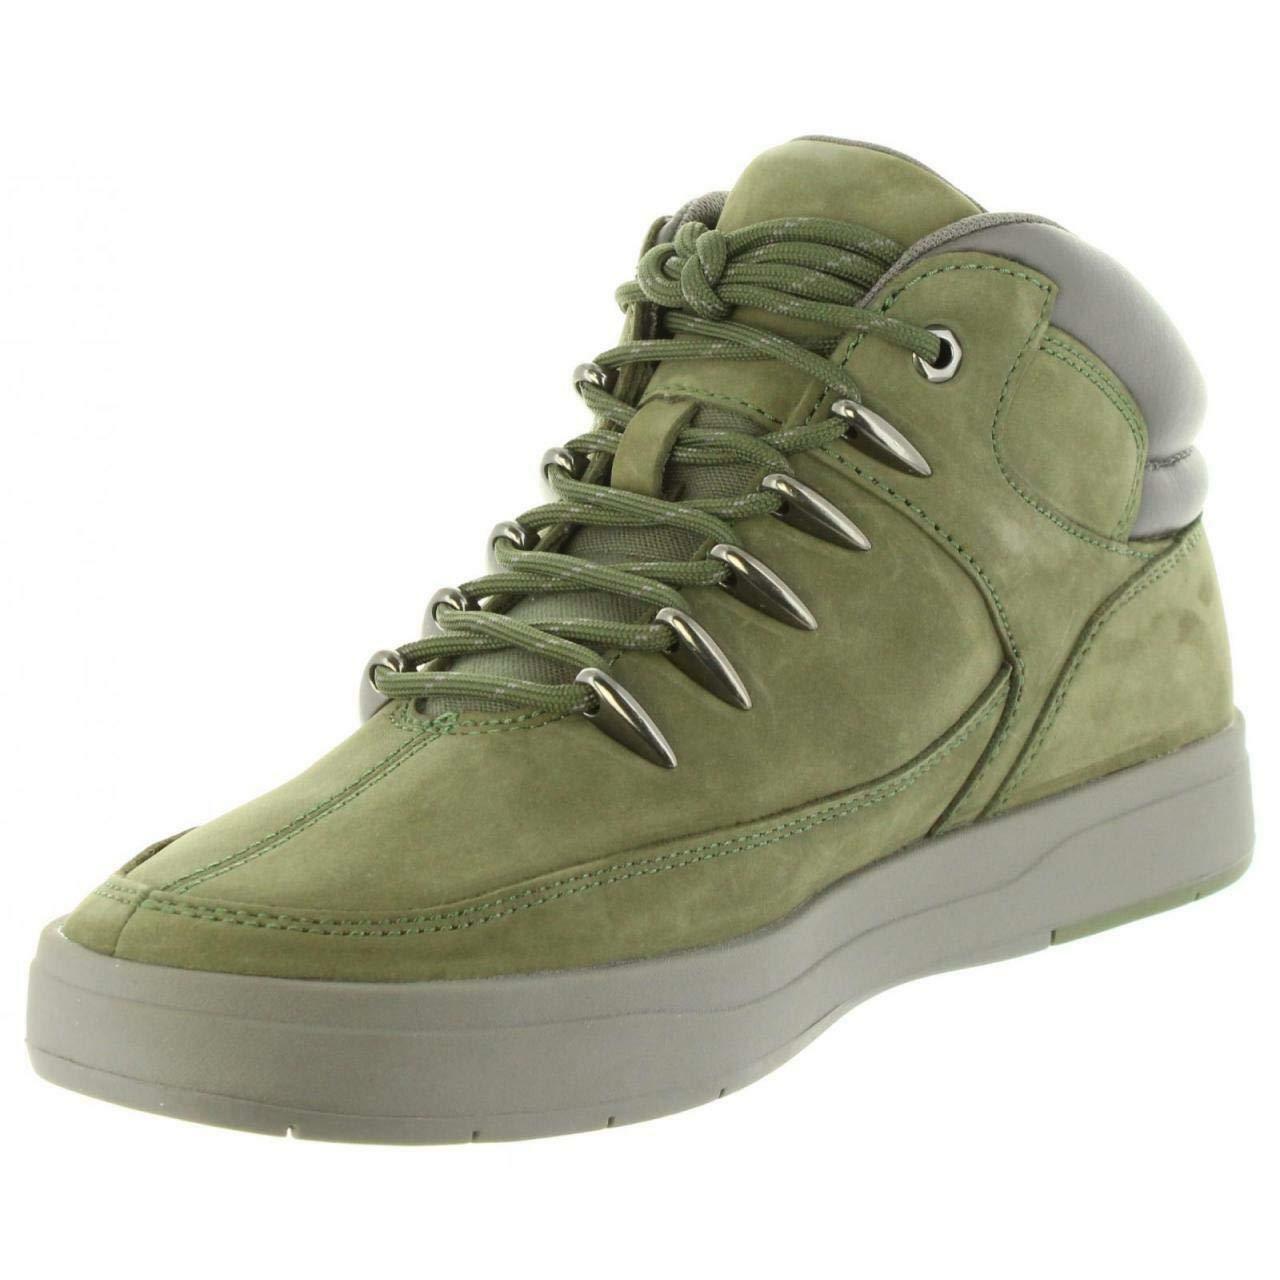 Timberland davis square scarpe uomo verdi 0a1v1t